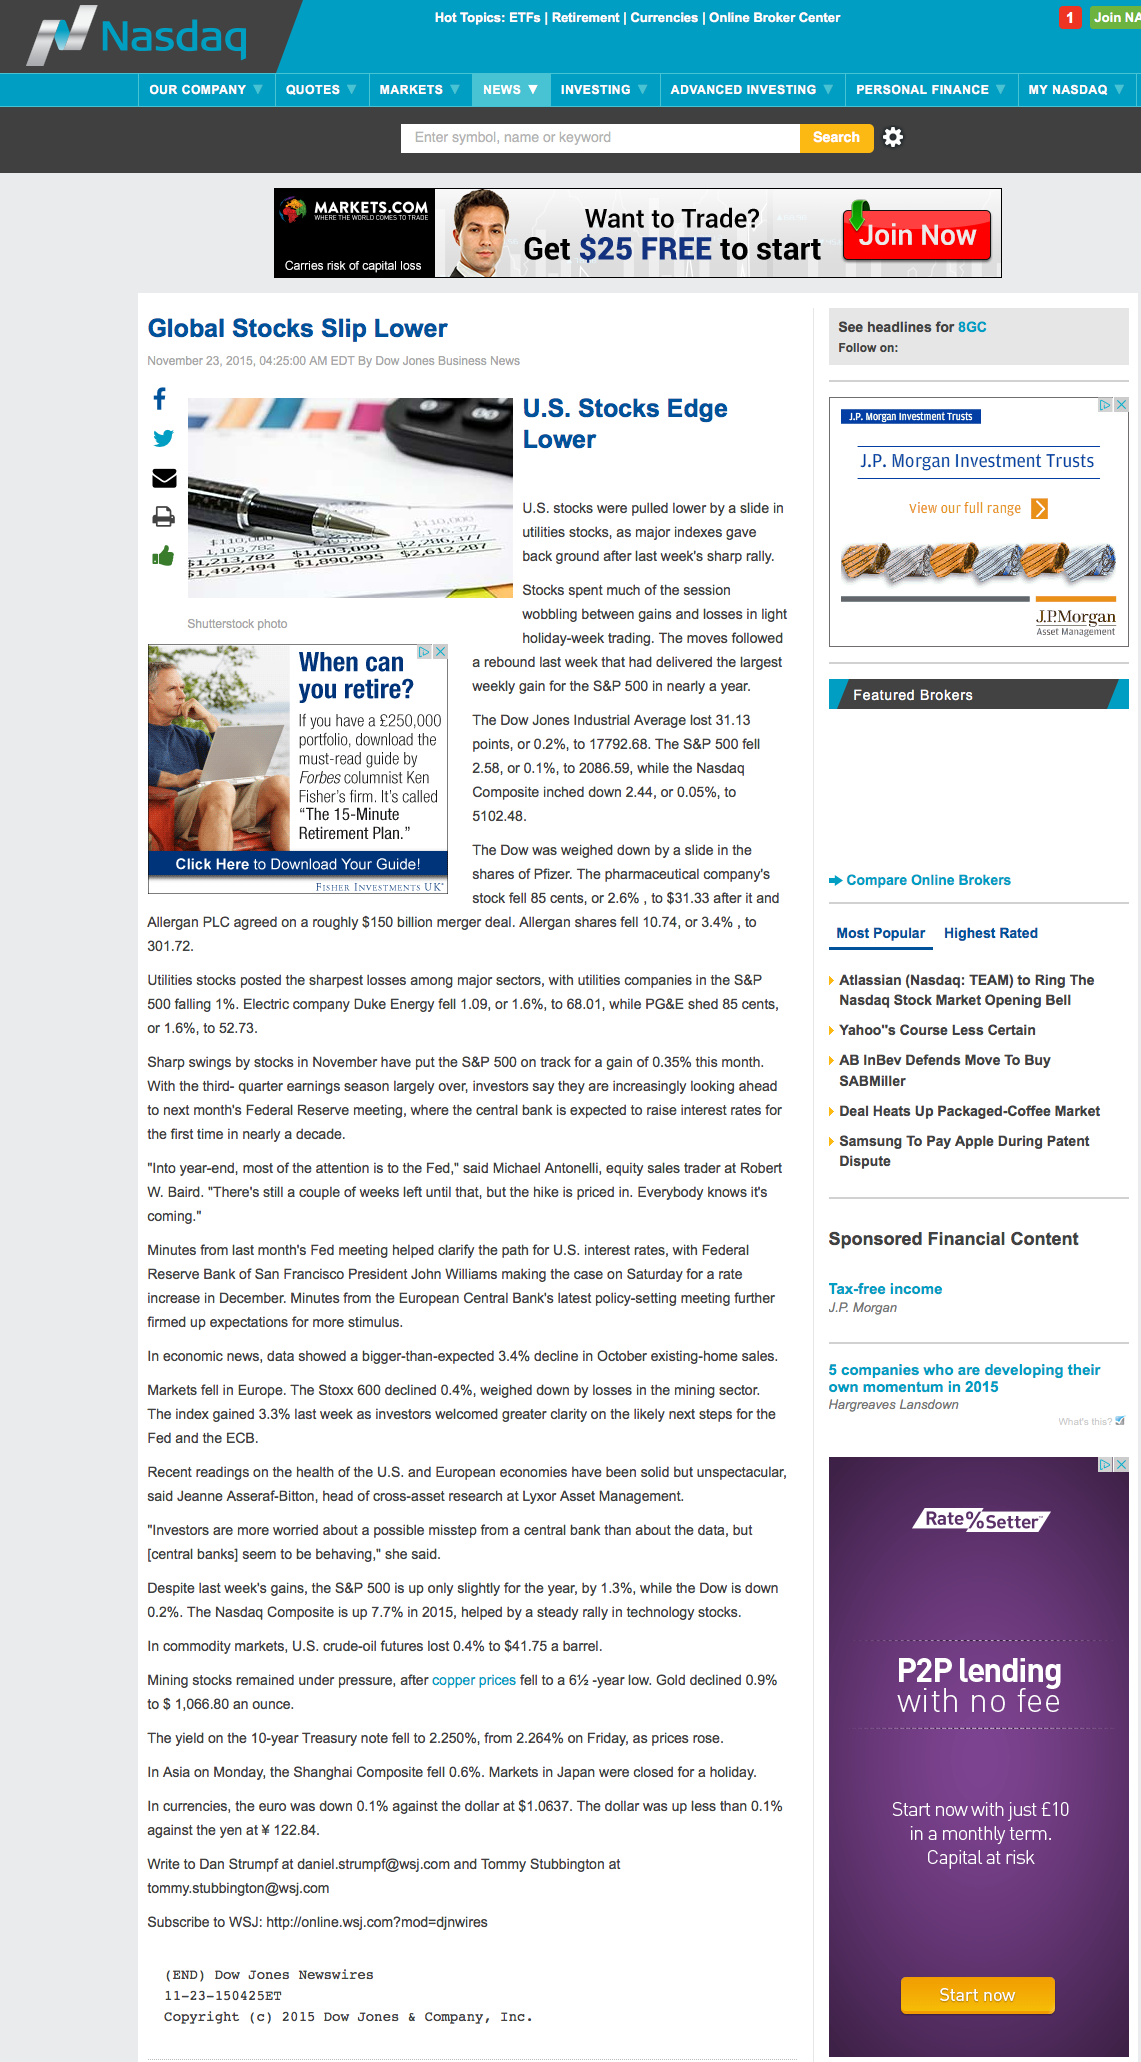 screenshot-www nasdaq com 2015-12-11 17-52-33